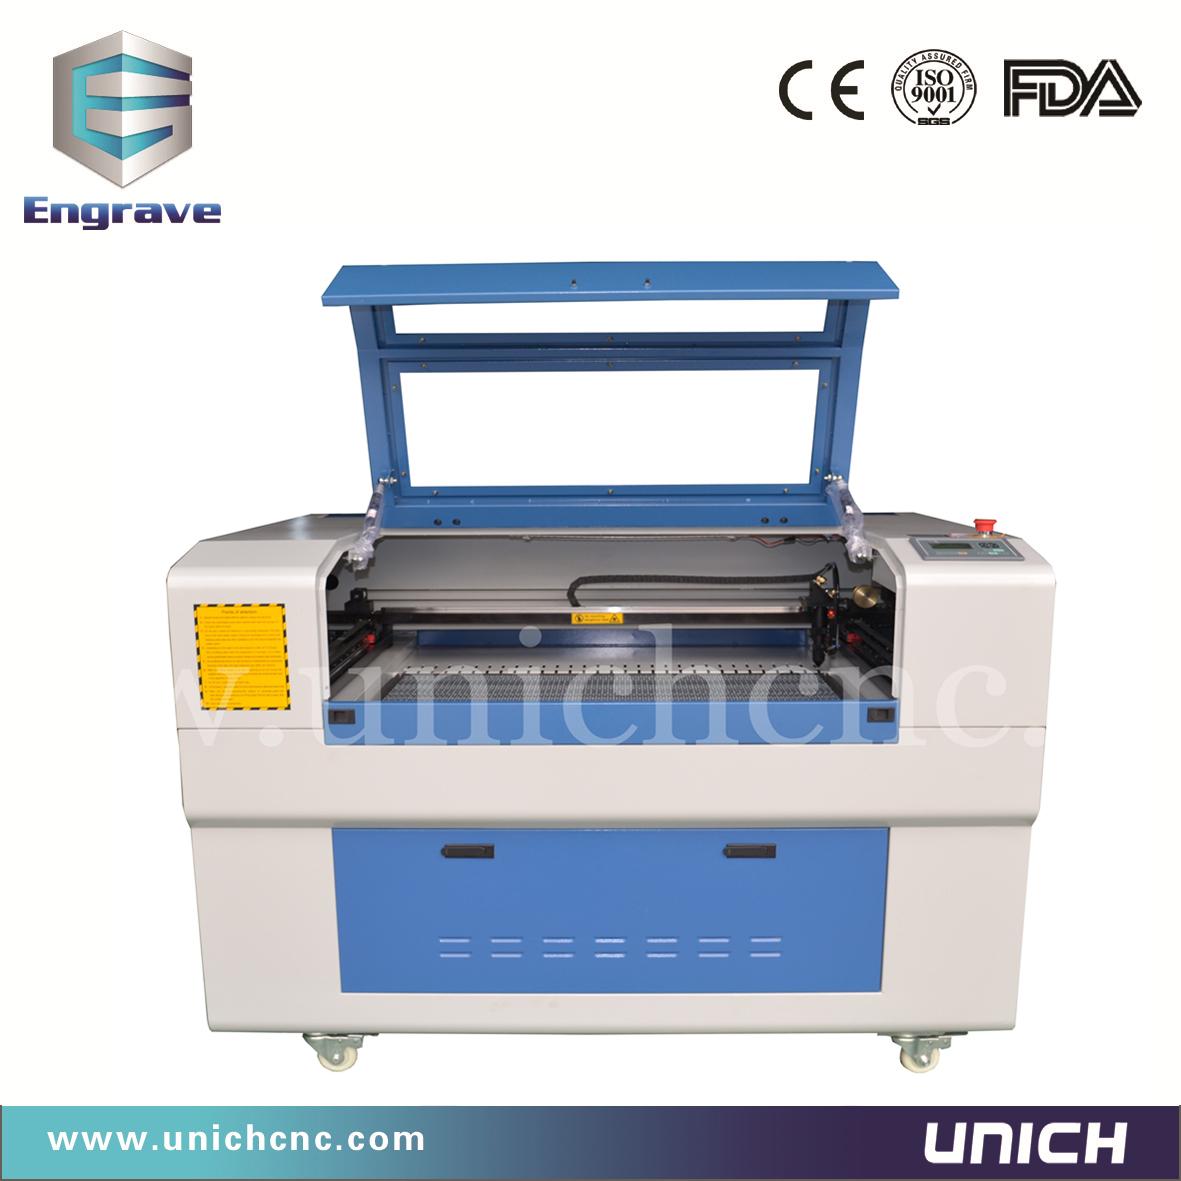 UNICH LXJ9060 CNC Laser (900x600mm working area )